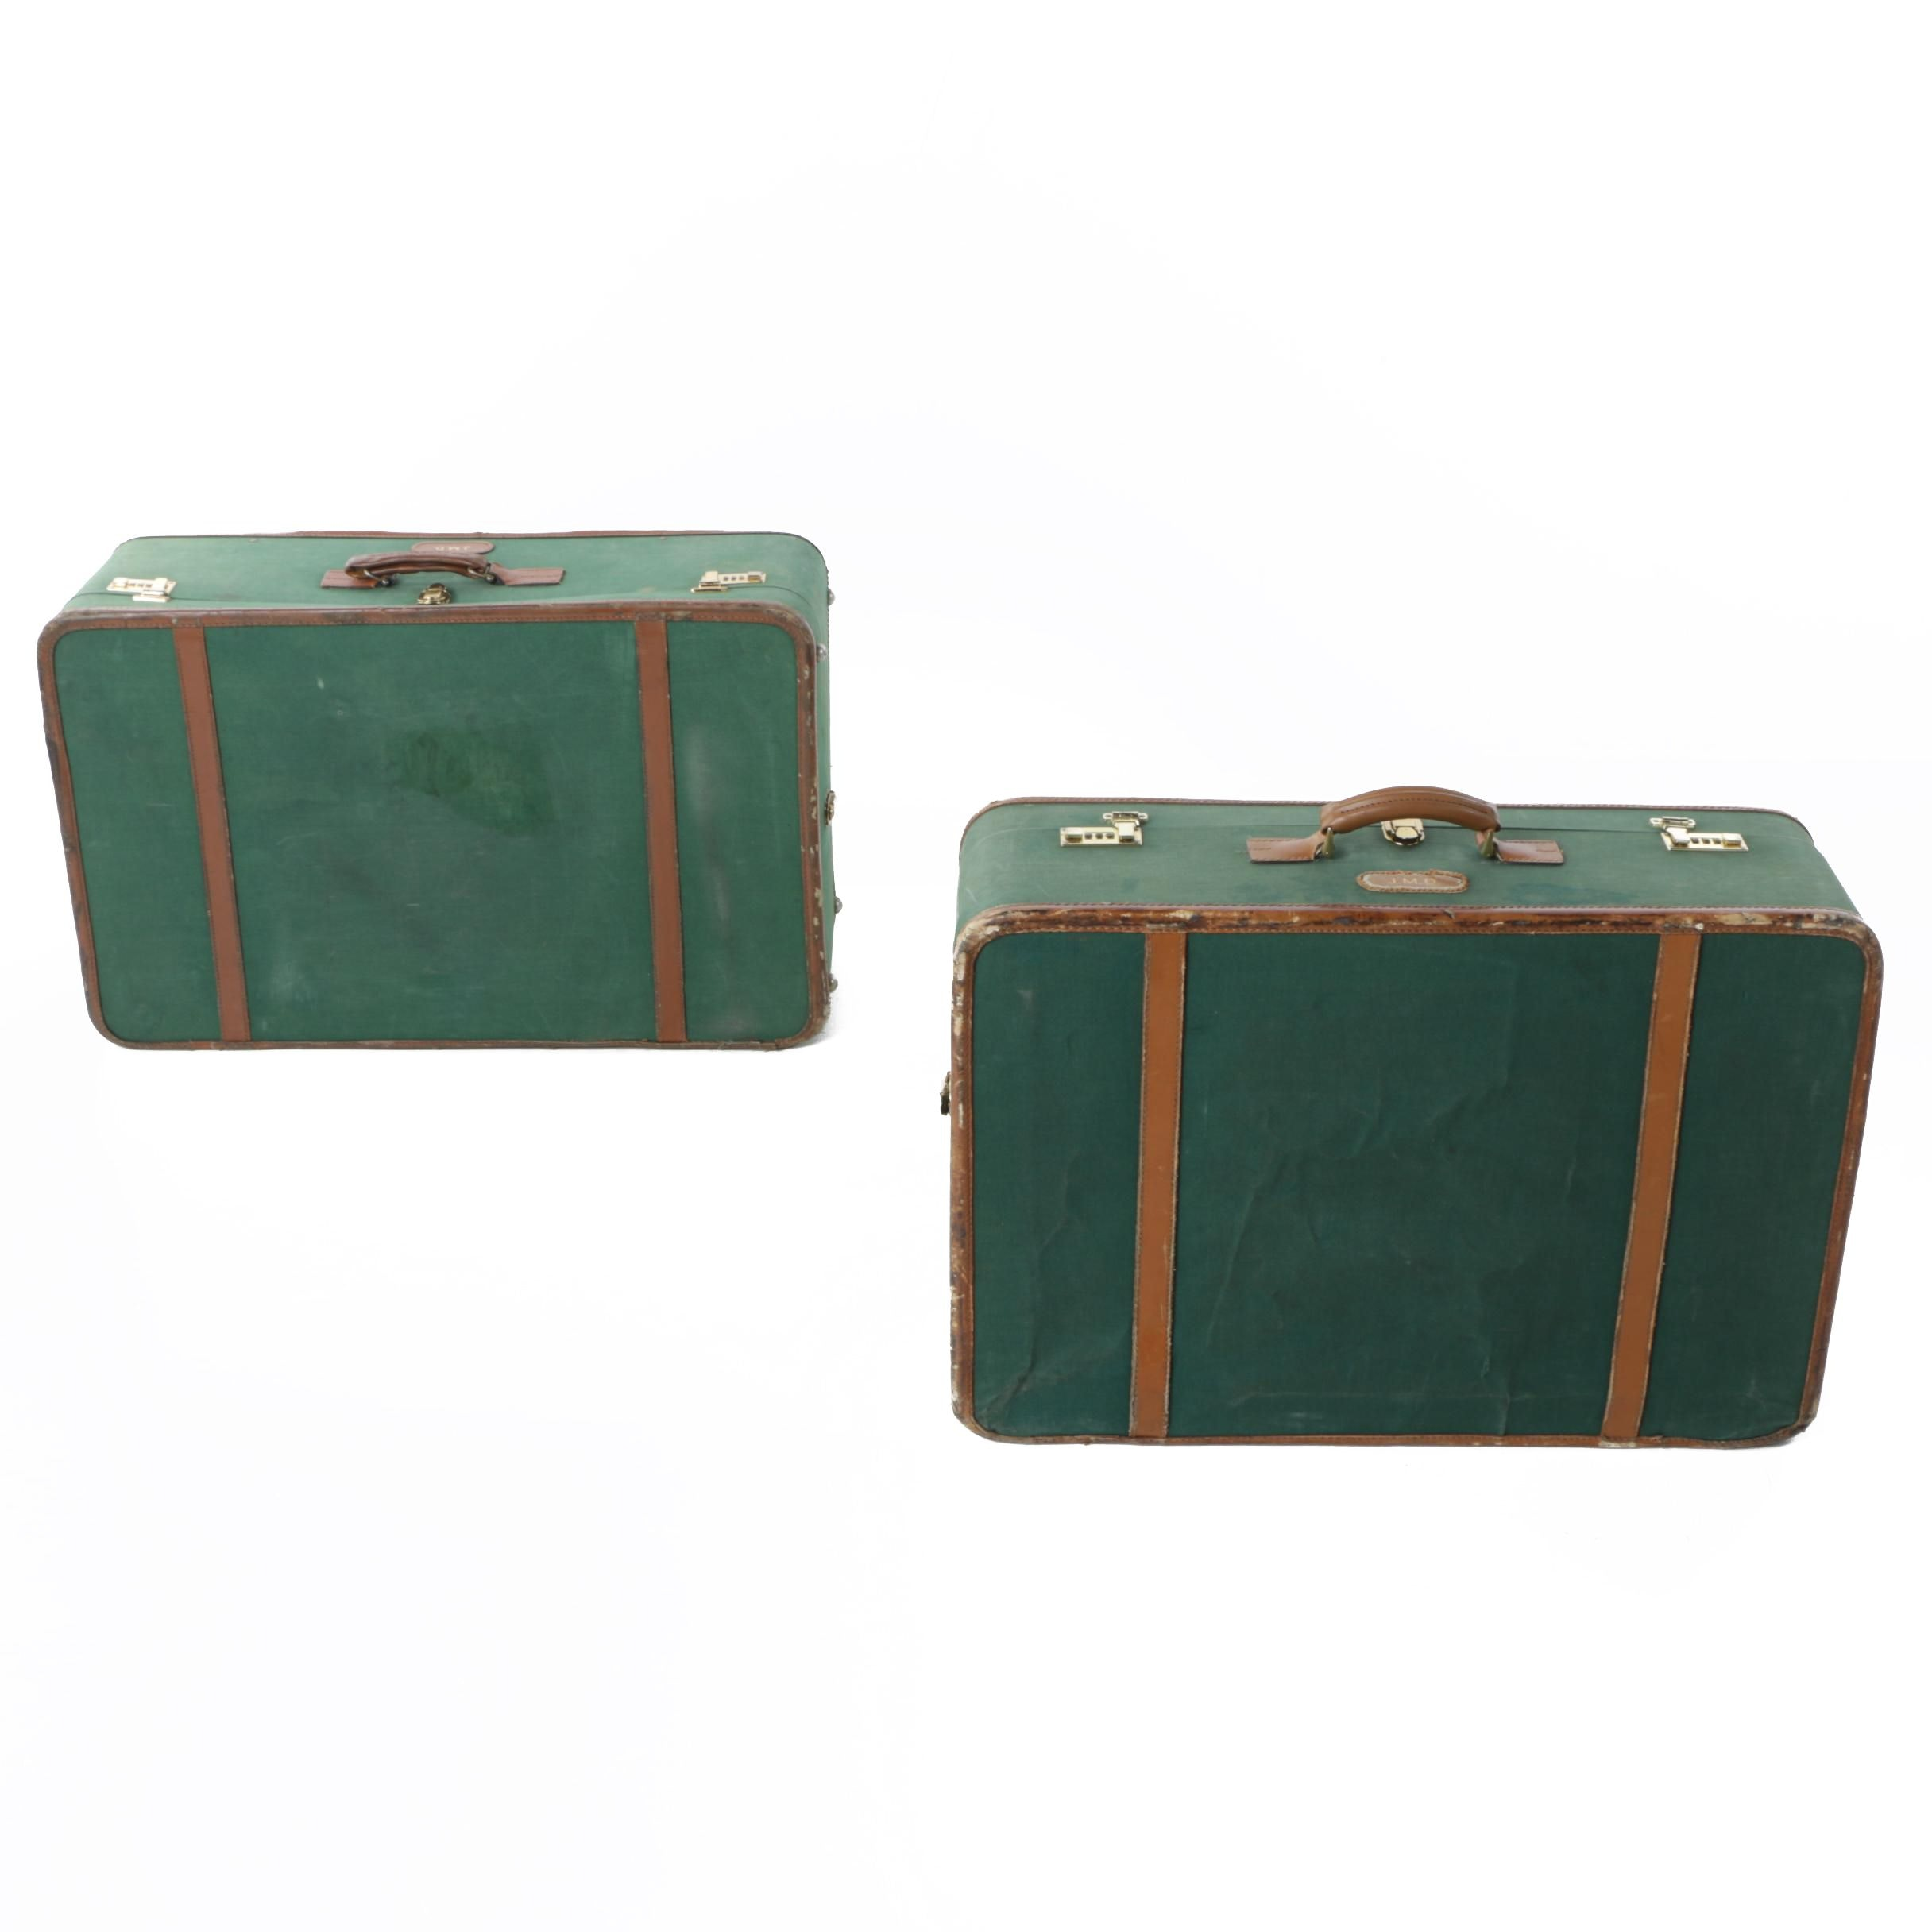 Vintage T. Anthony Ltd. Large Green Luggage Set